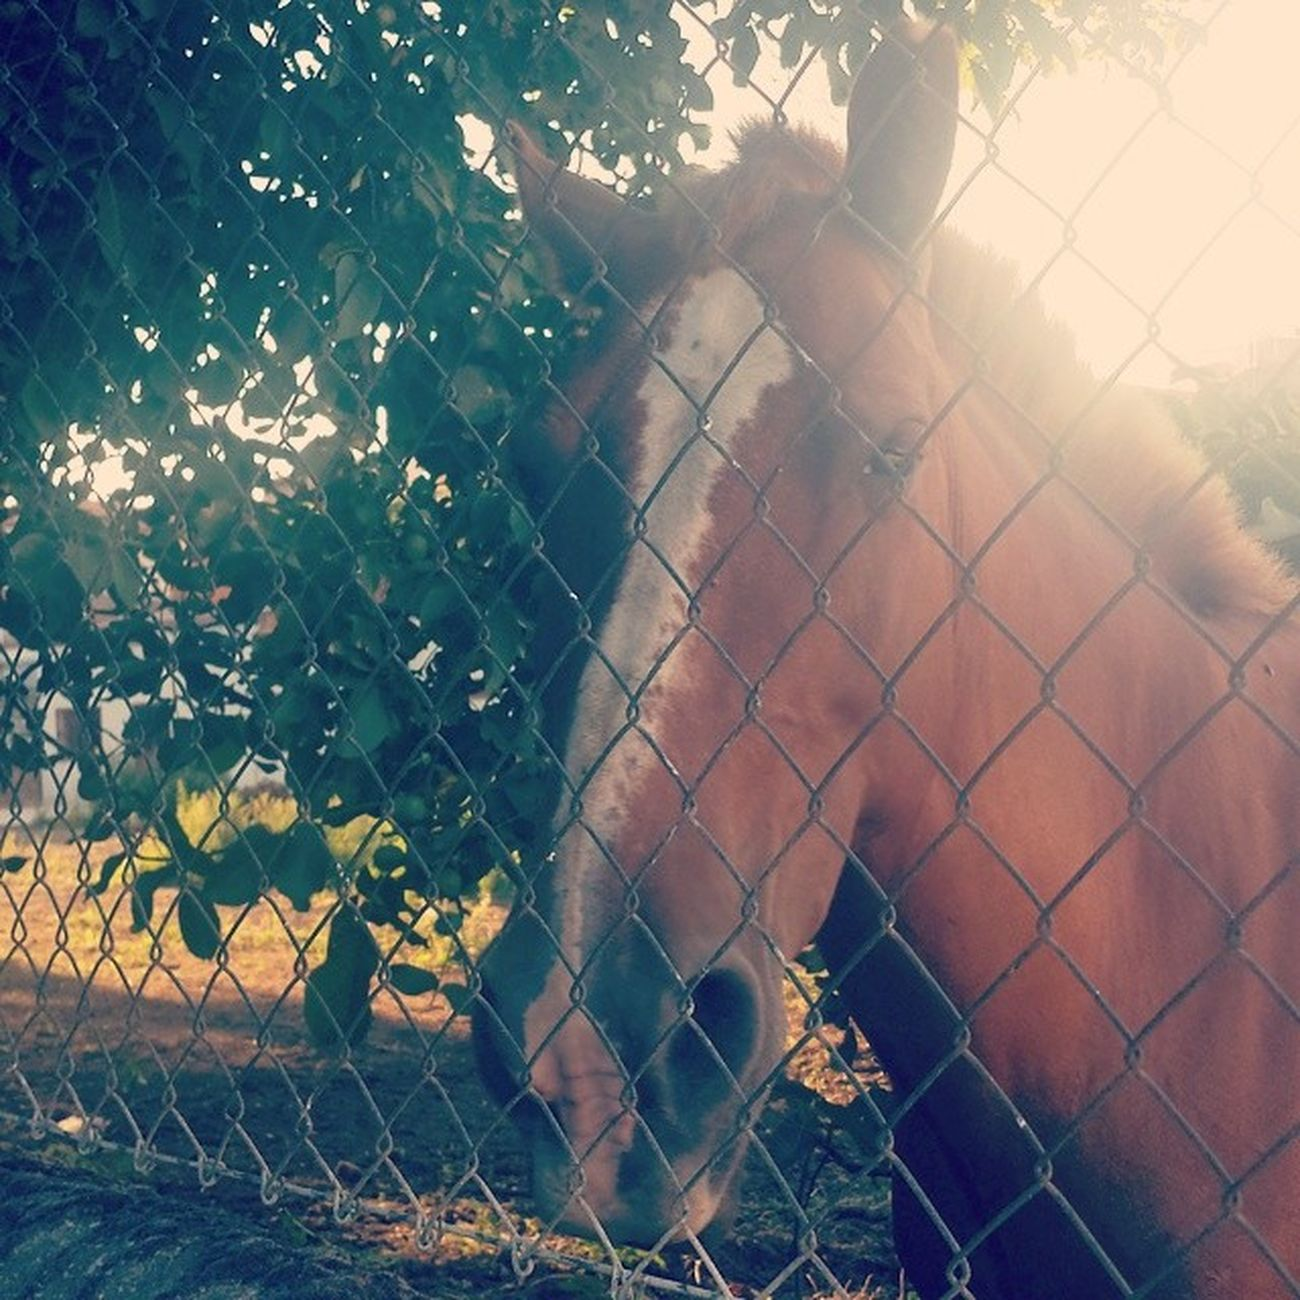 Pues aqui andamos con mi amigo el caballo <3 MissiMissi Caballo